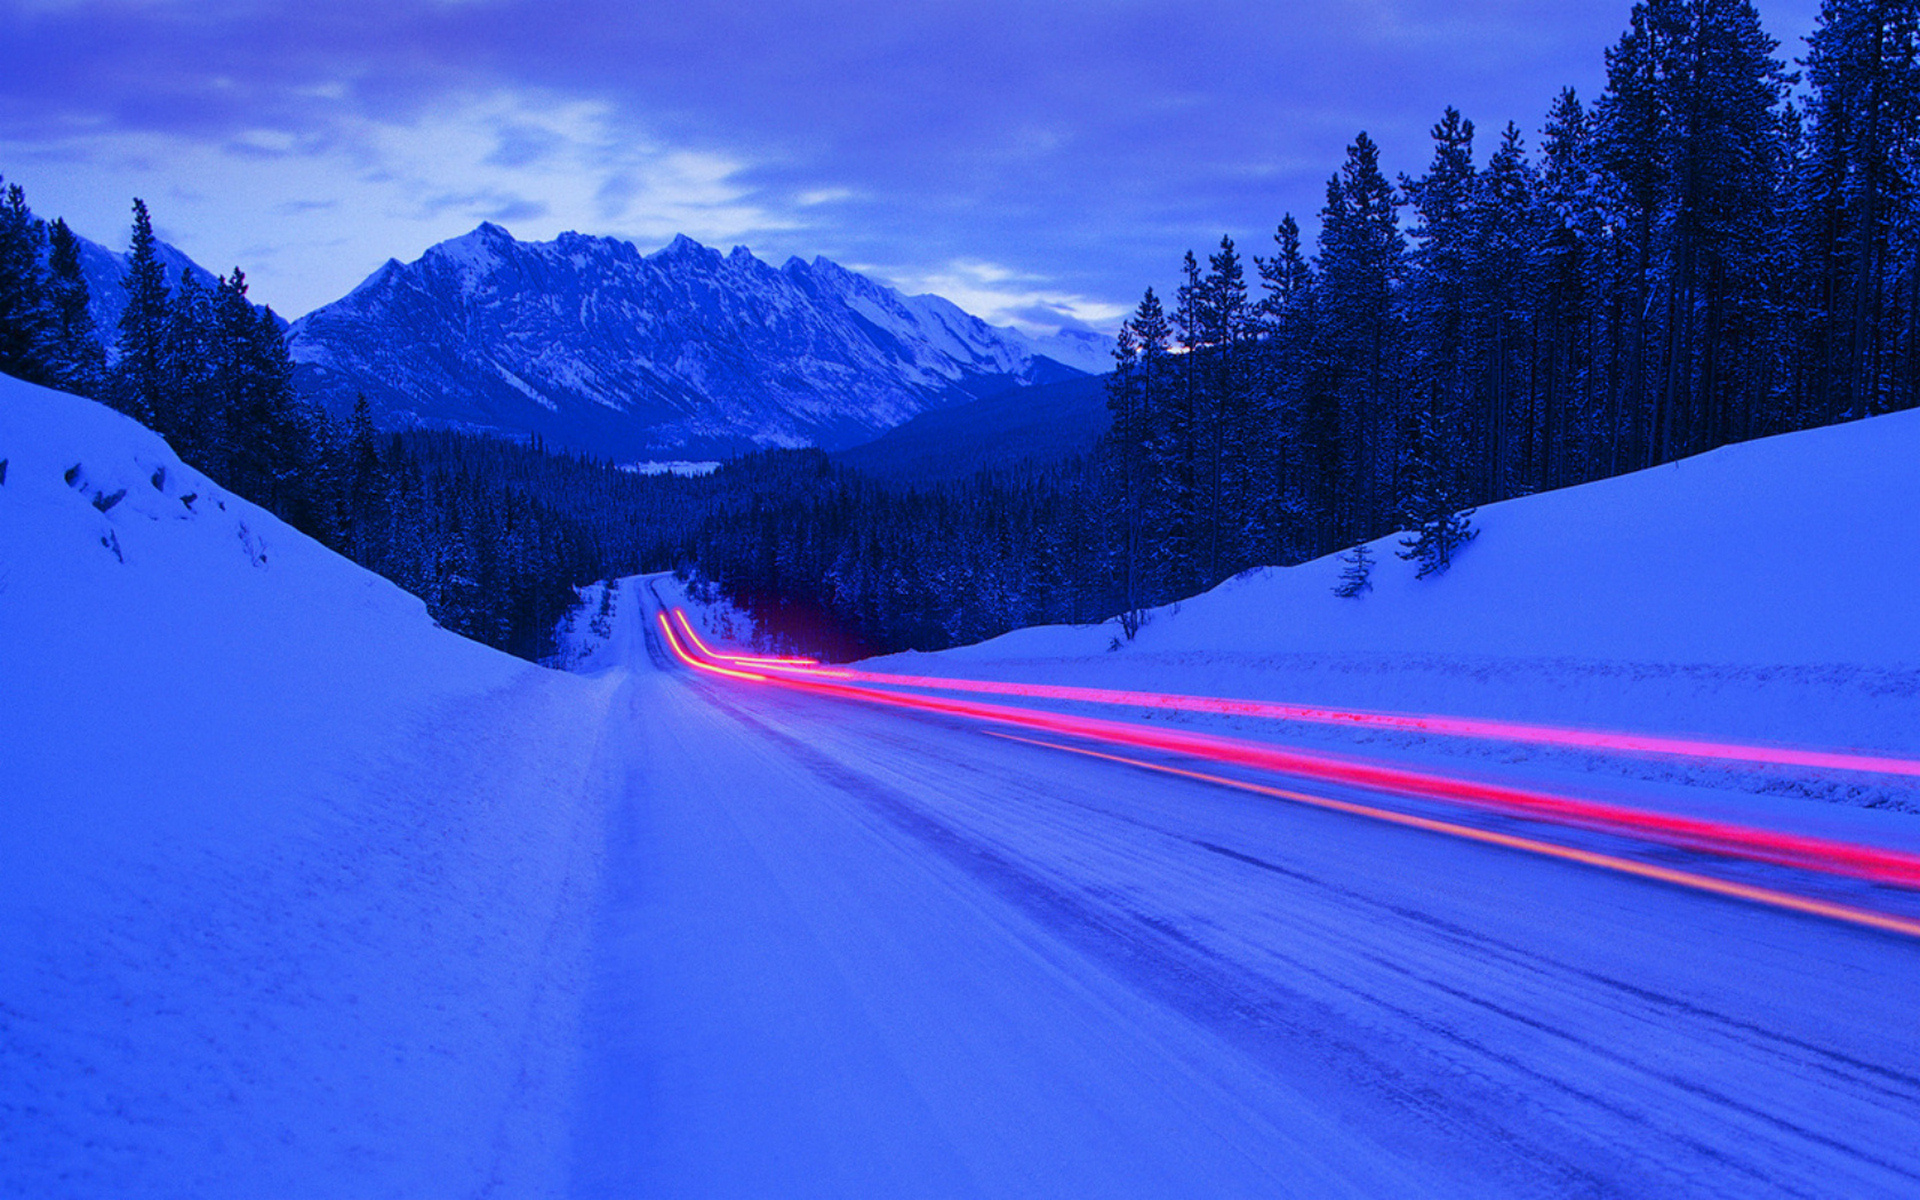 дорога лед Норвегия бесплатно